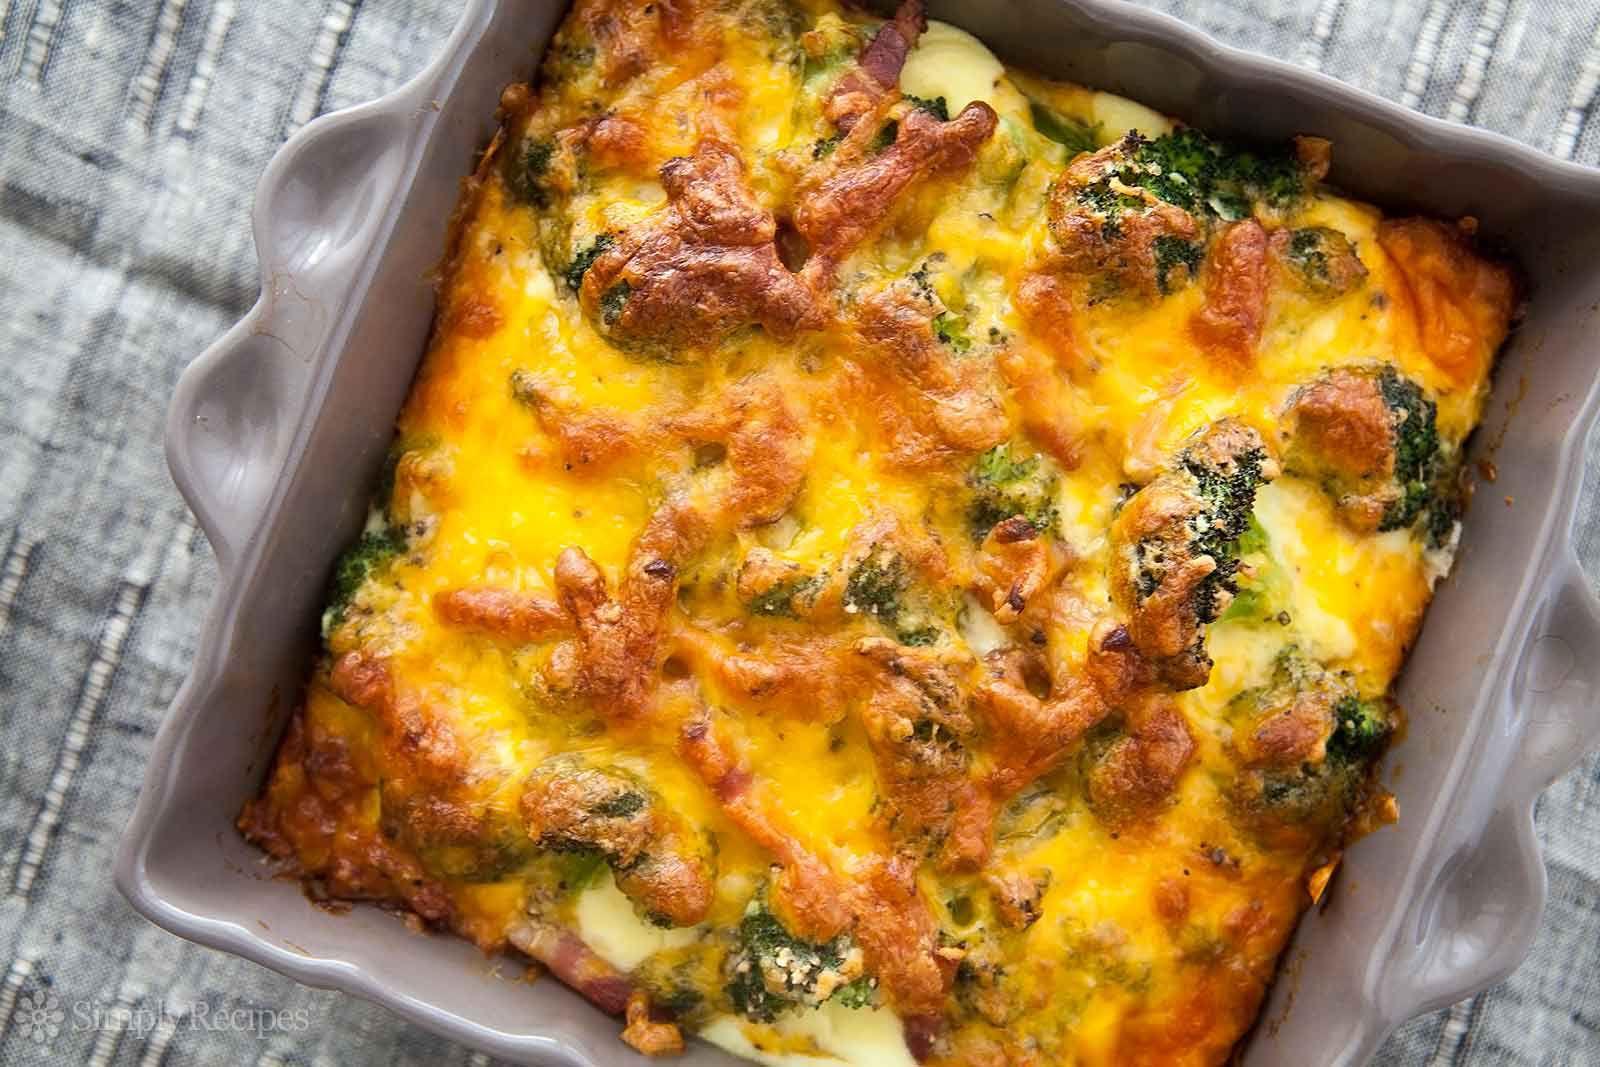 Broccoli Cheese Casserole - an easy broccoli casserole you'll love!